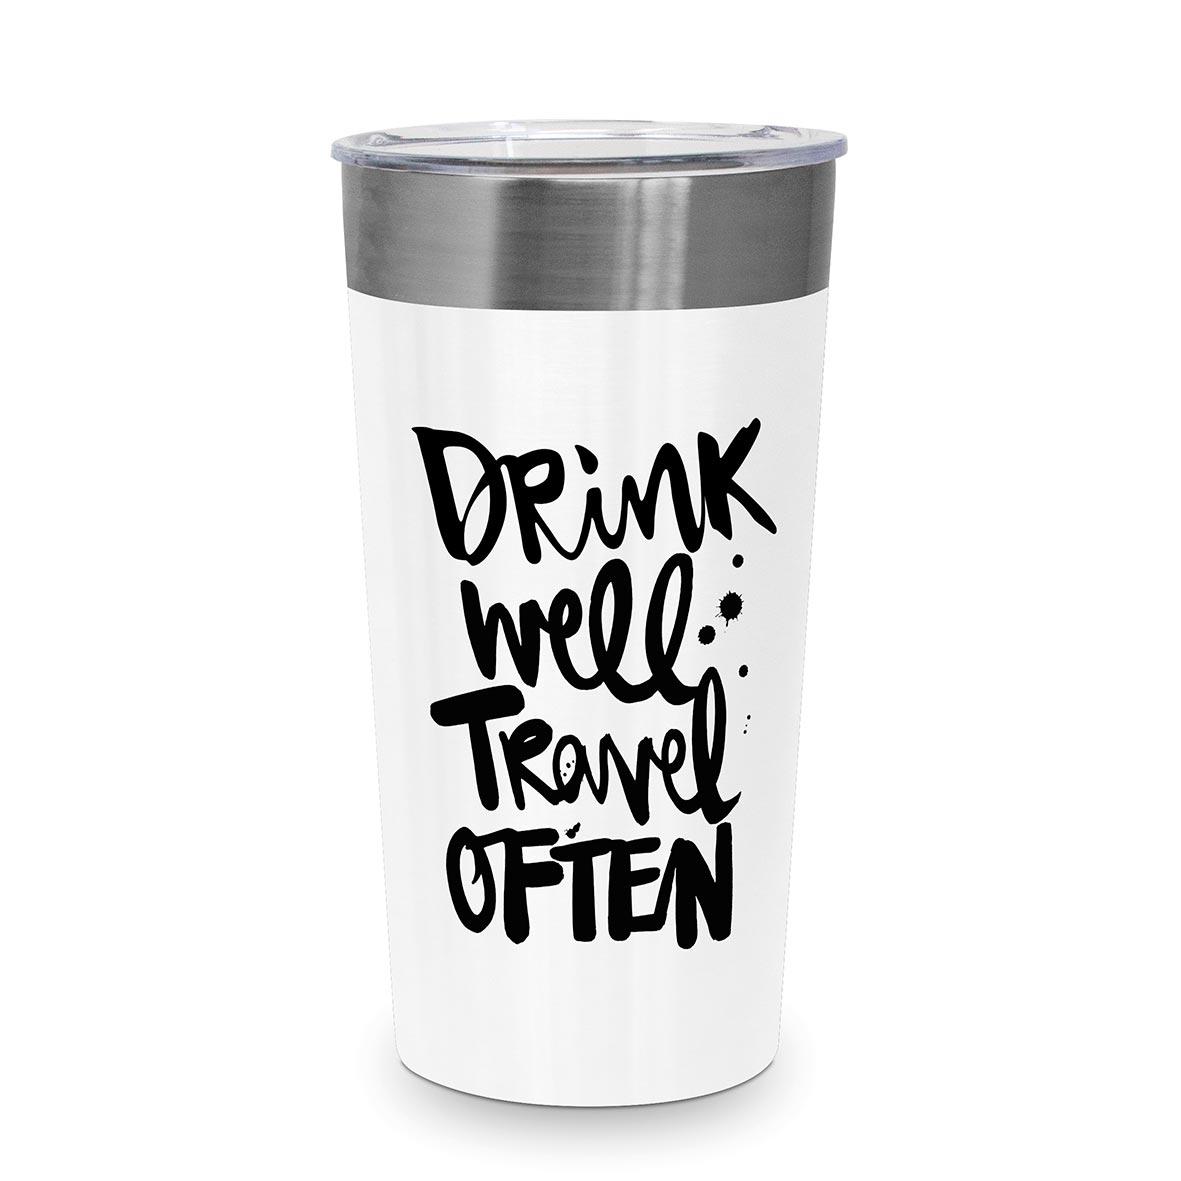 Drink well Steel Travel Mug